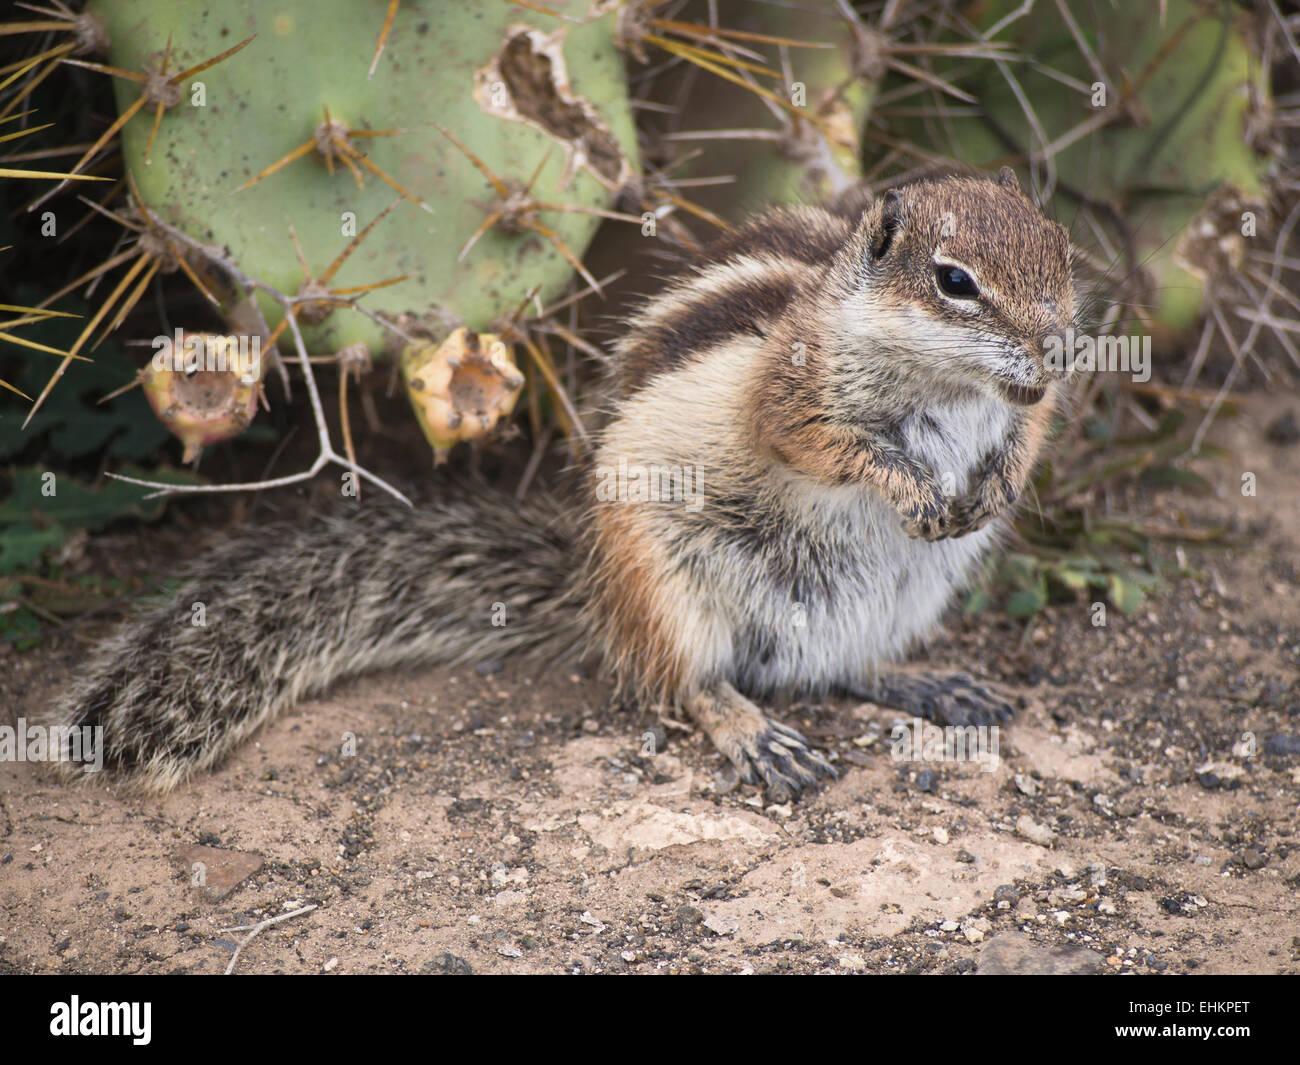 barbary-ground-squirrel-atlantoxerus-get